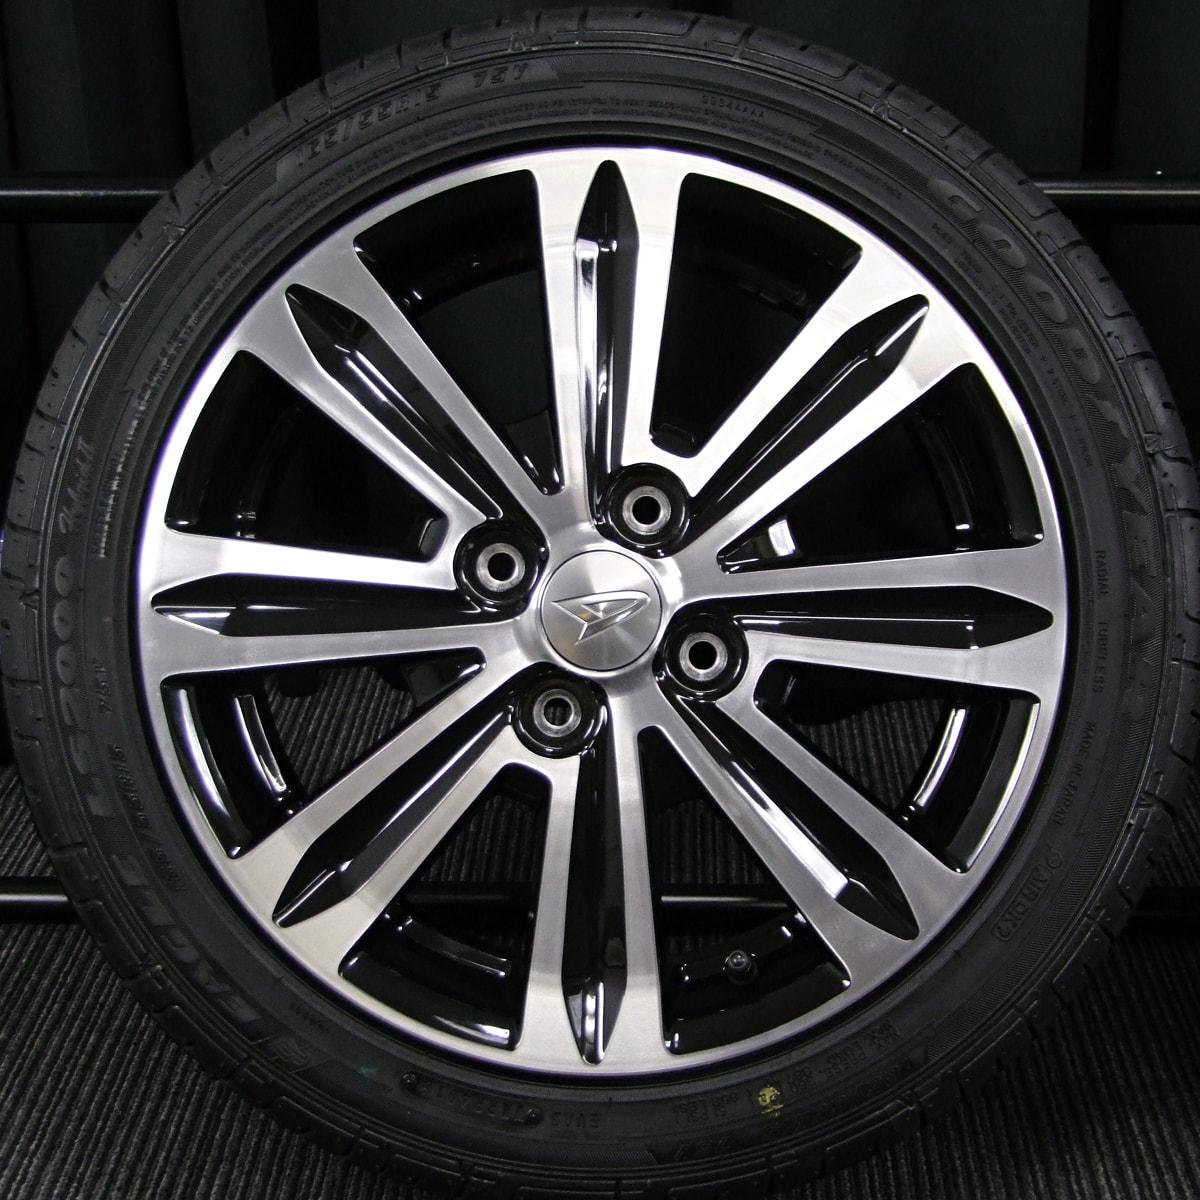 DAIHATSU タントカスタム 純正 ブラック&ポリッシュ GOODYEAR EAGLE LS2000 Hybrid2 165/55R15 4本SET